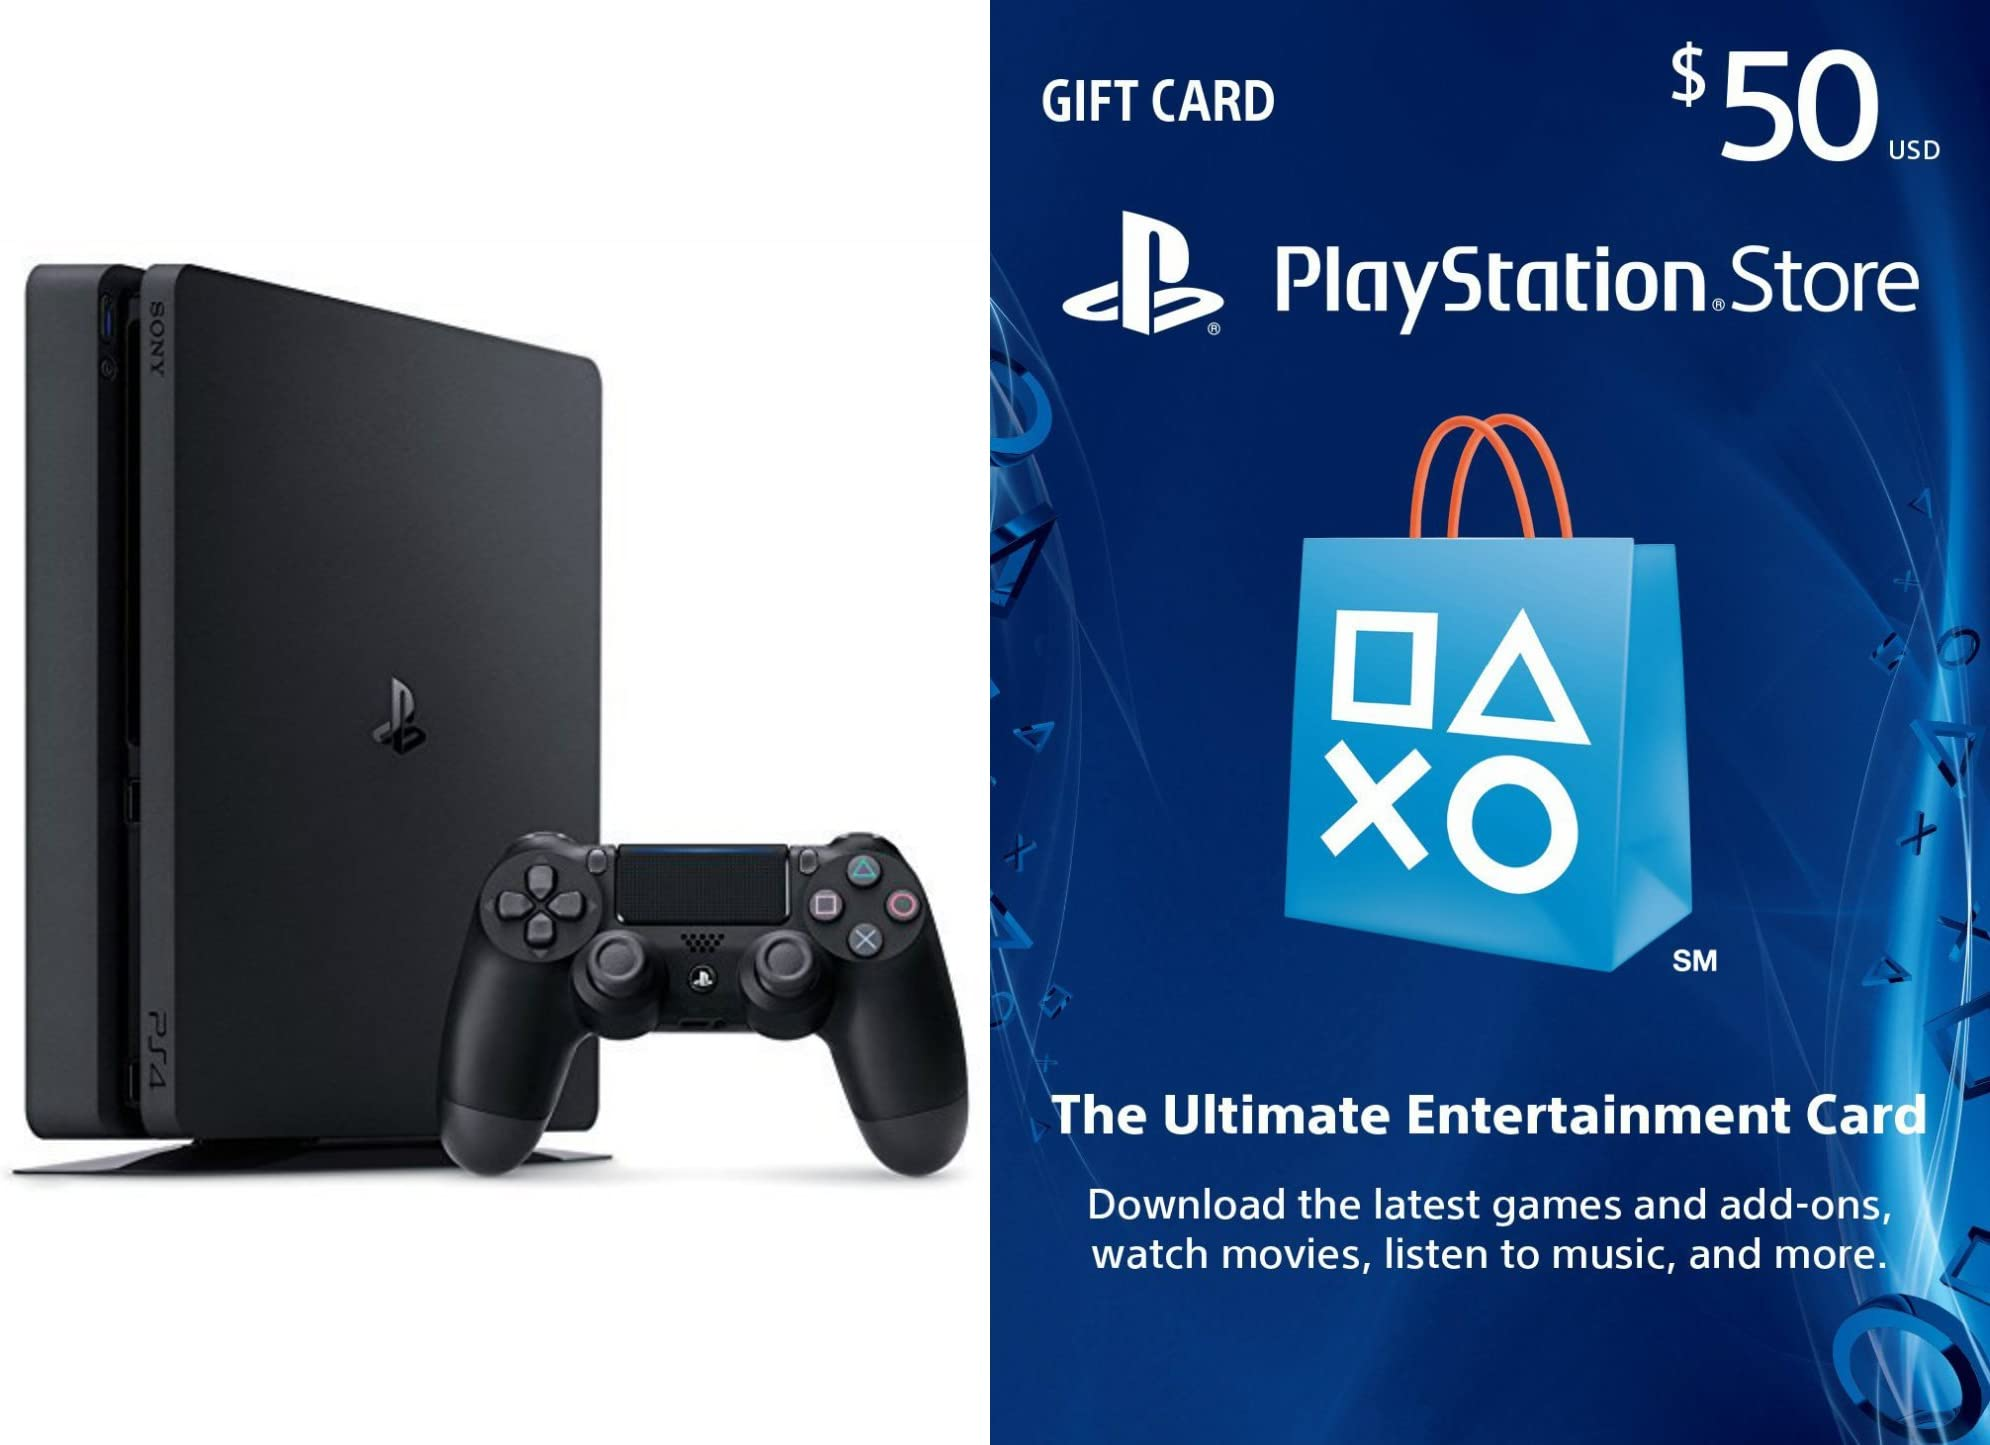 Amazoncom Playstation 4 Slim 500gb Console 50 Store Psn Usd Image Unavailable